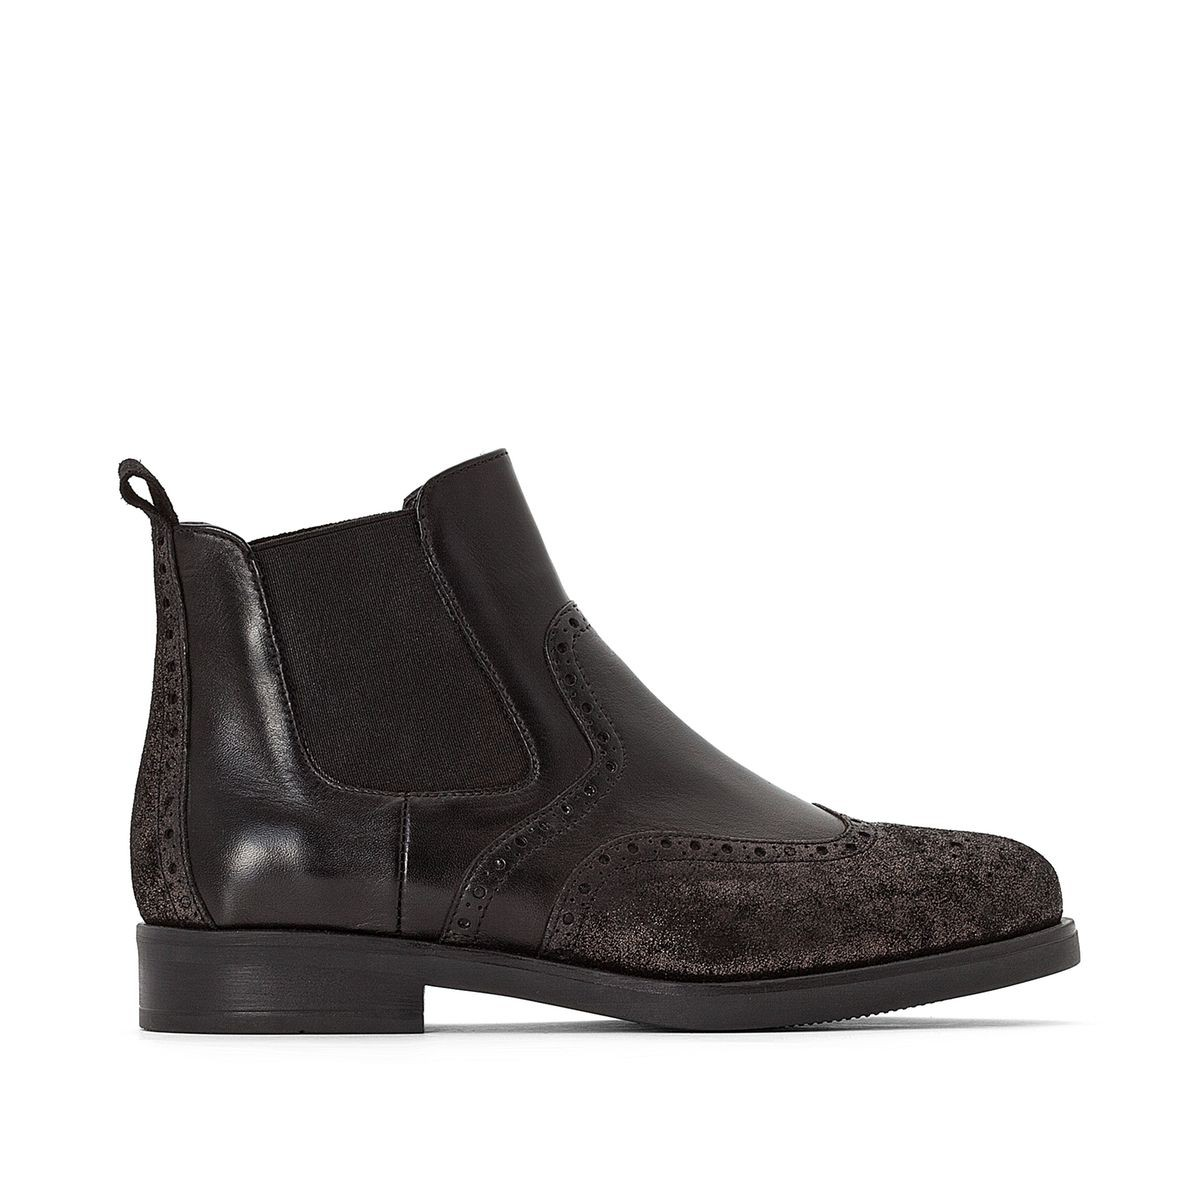 Chelsea ExclusivitéProductsBoots cuir Boots Chelsea ExclusivitéProductsBoots cuirCuir cuir Boots thCsxdrQ